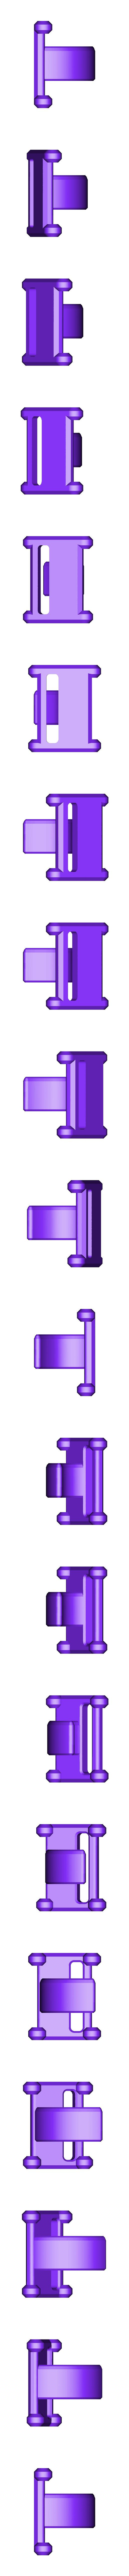 6_Cable_hook.stl Download free STL file Headphone holder • 3D printable object, Osichan